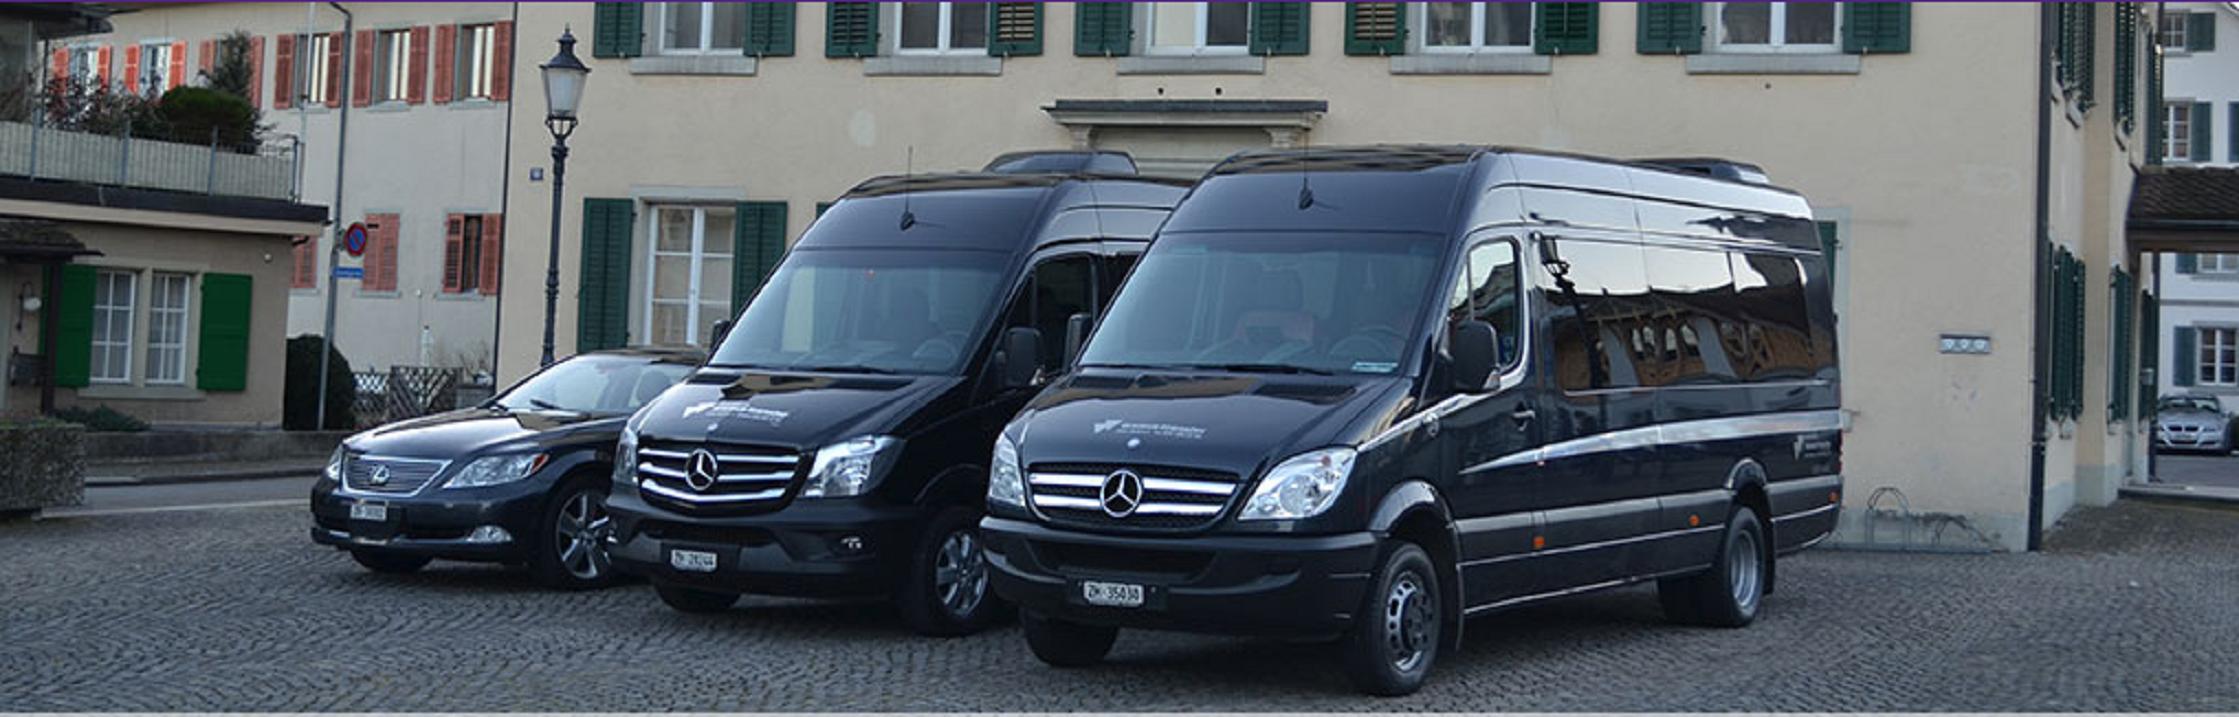 Dreieck-Transfer-Transport u. Logistik AG